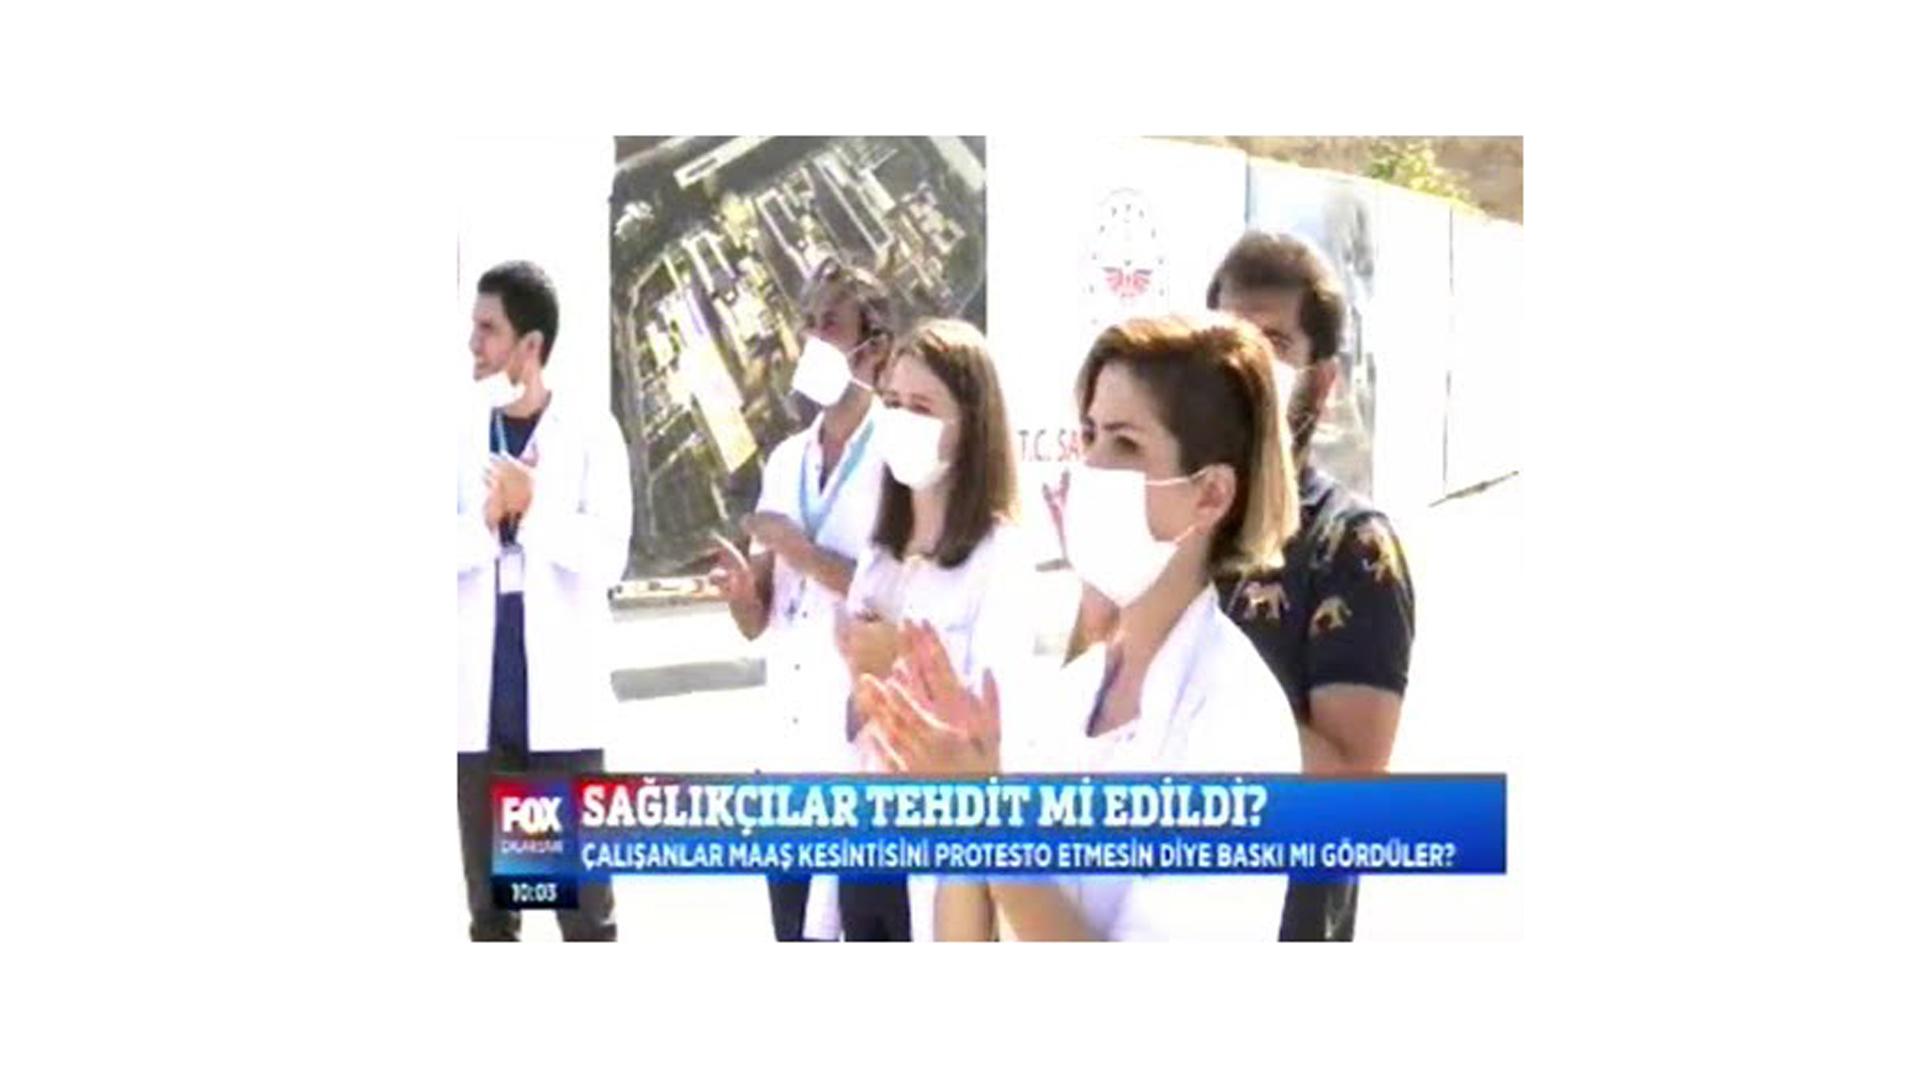 https://istabip.org.tr/site_icerik/2020/ekim/3ddefault-hekim-devletin-hastane-sirketin-foxtvhaber.jpg